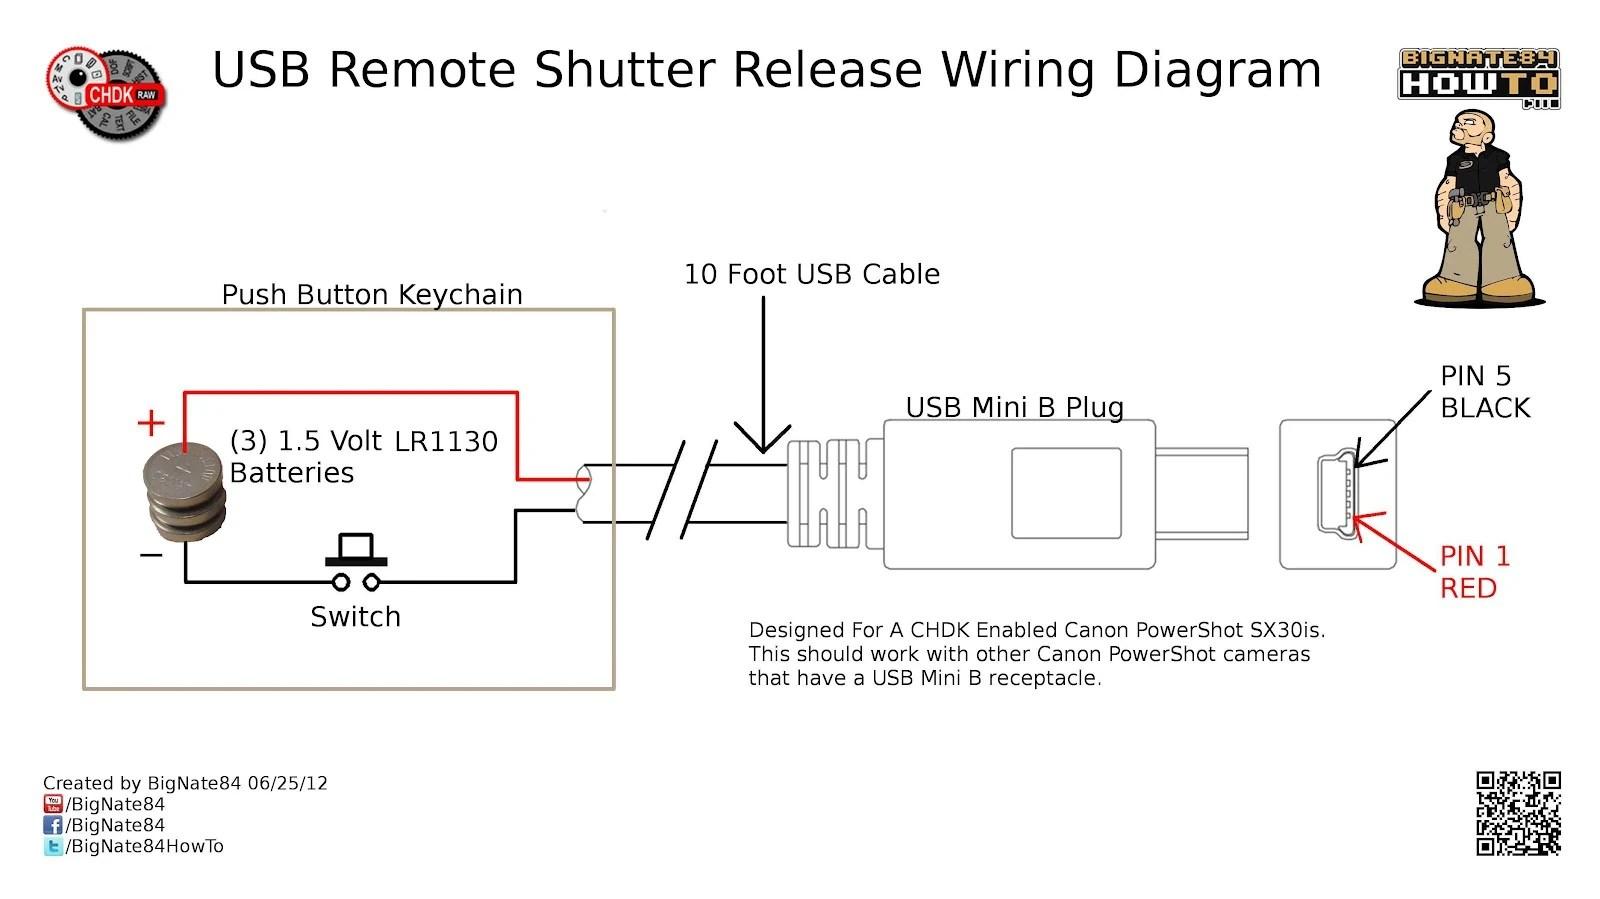 Image 0001 USB Remote Shutter Wiring Diagram 1 Jpeg CHDK Wiki